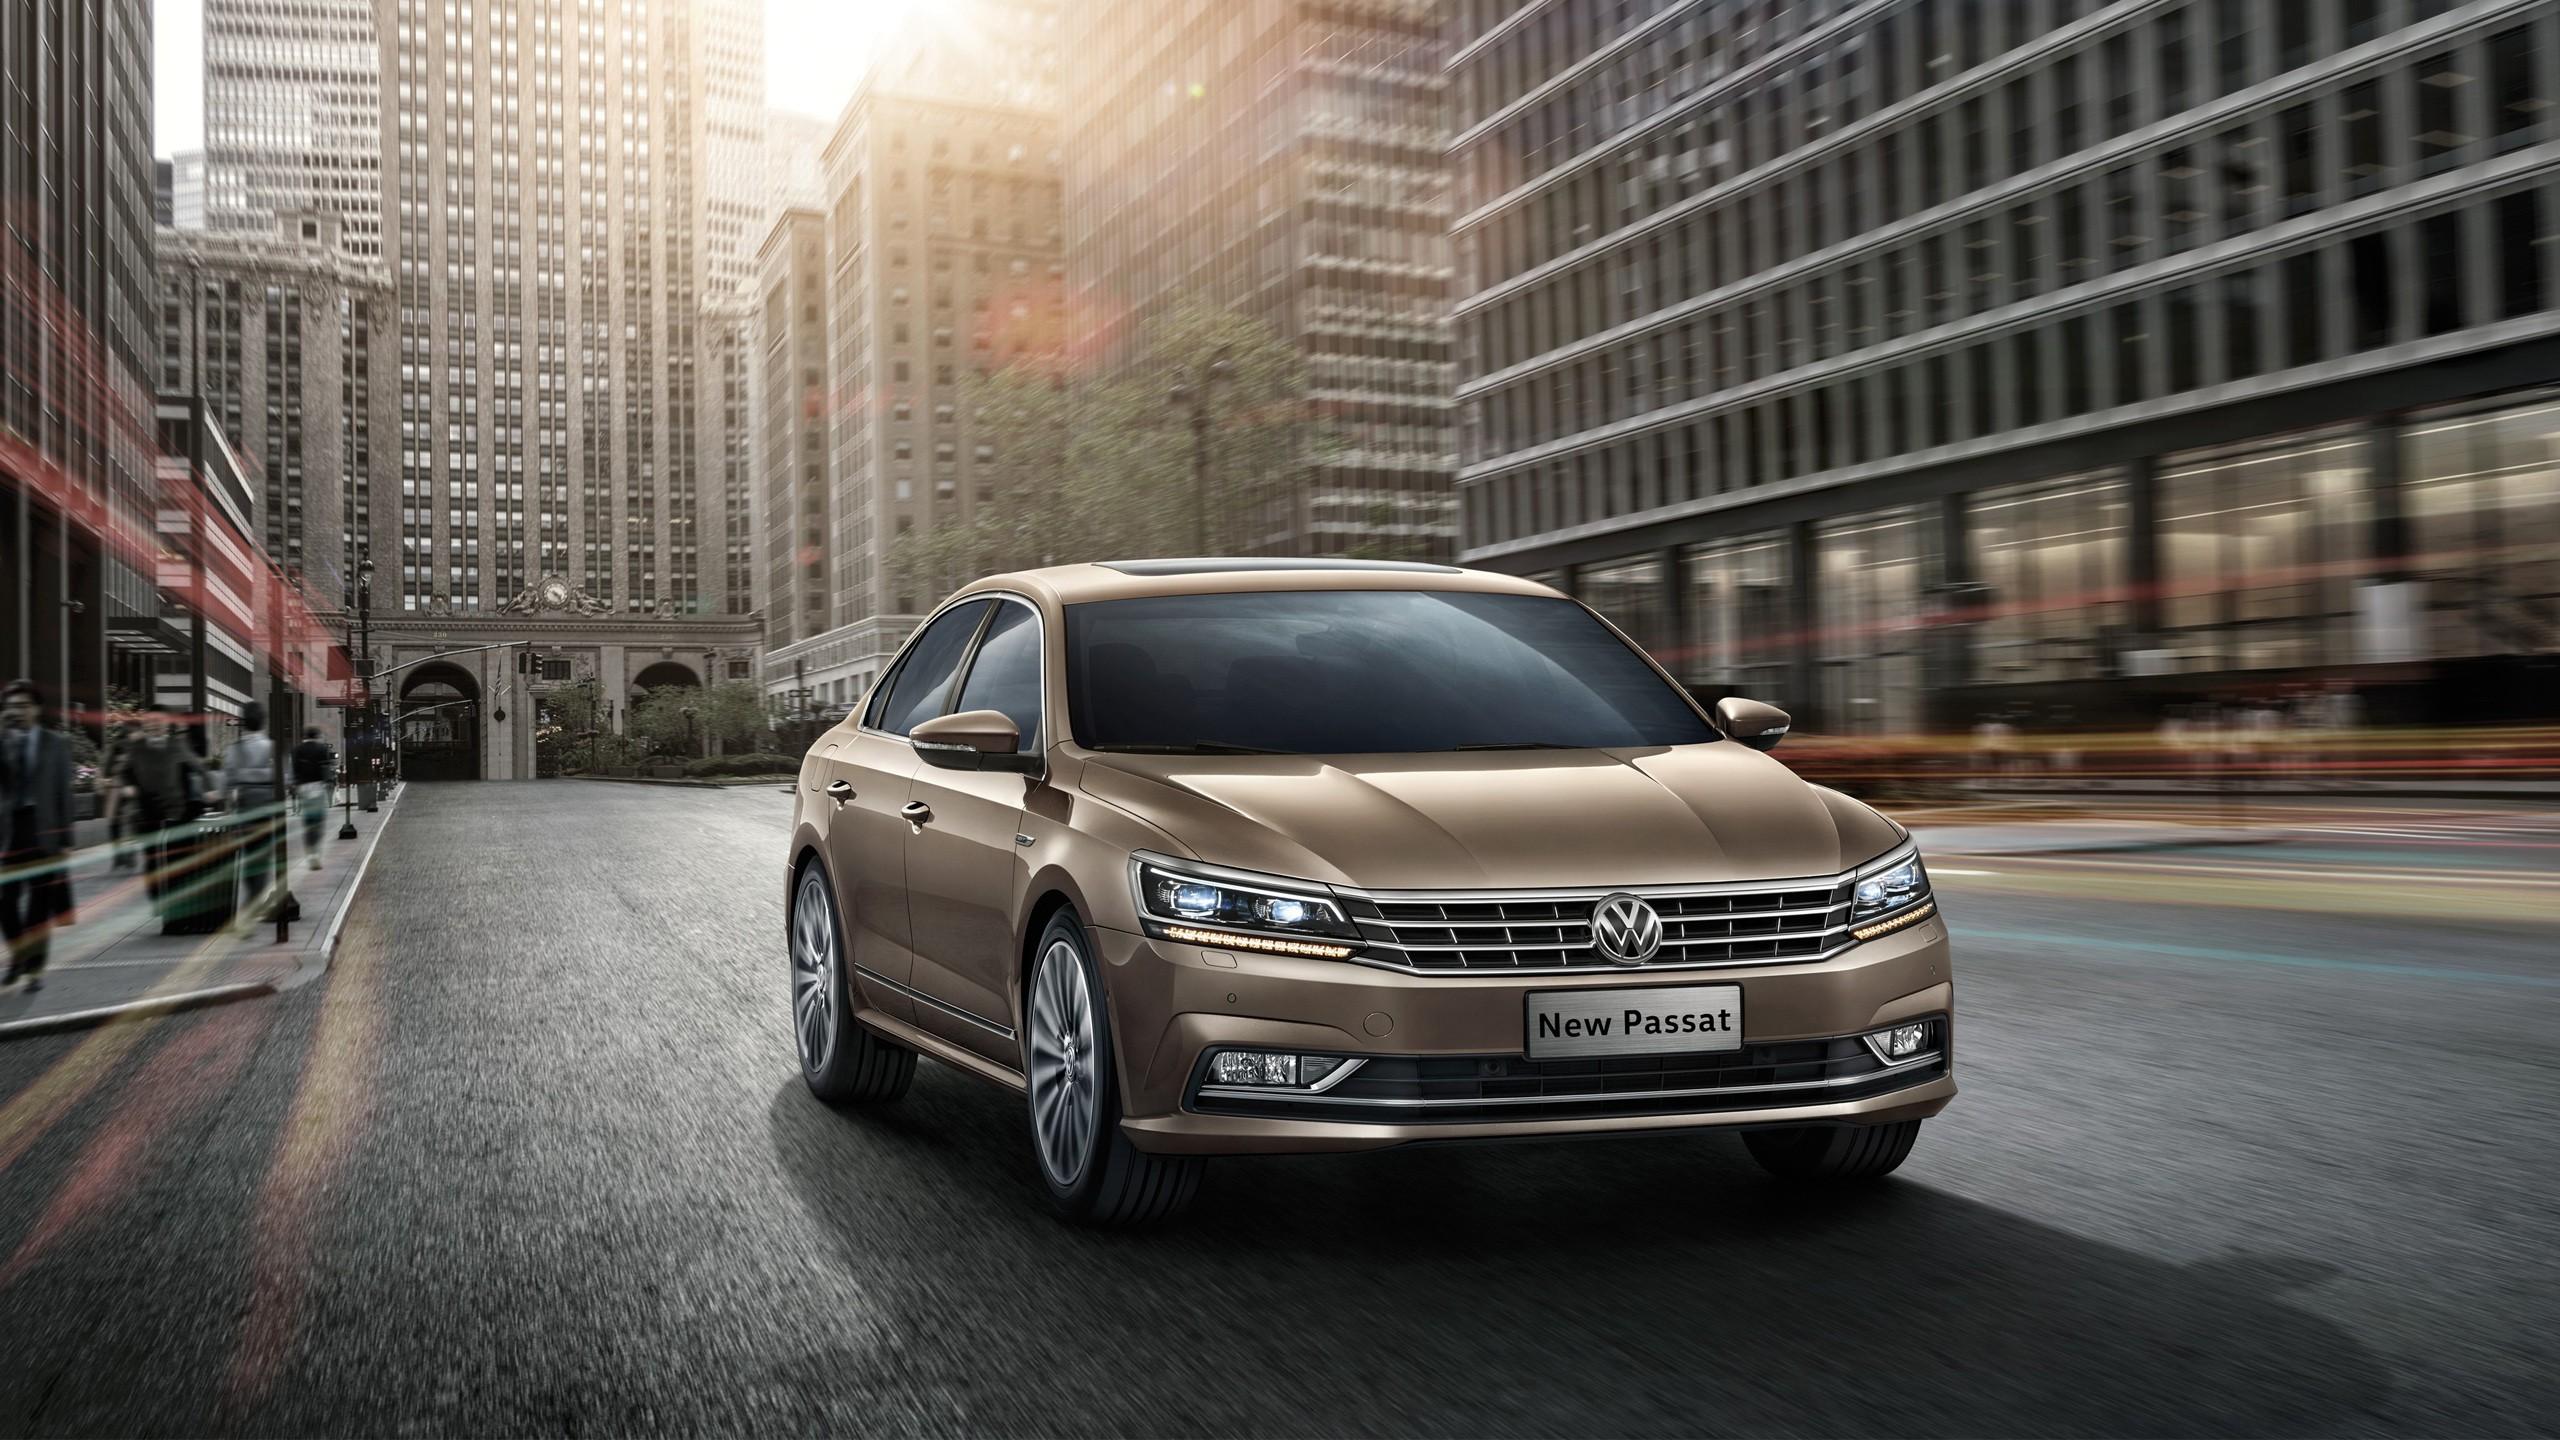 Lincoln Wallpaper Car Volkswagen Passat Cn Spec 2016 Wallpaper Hd Car